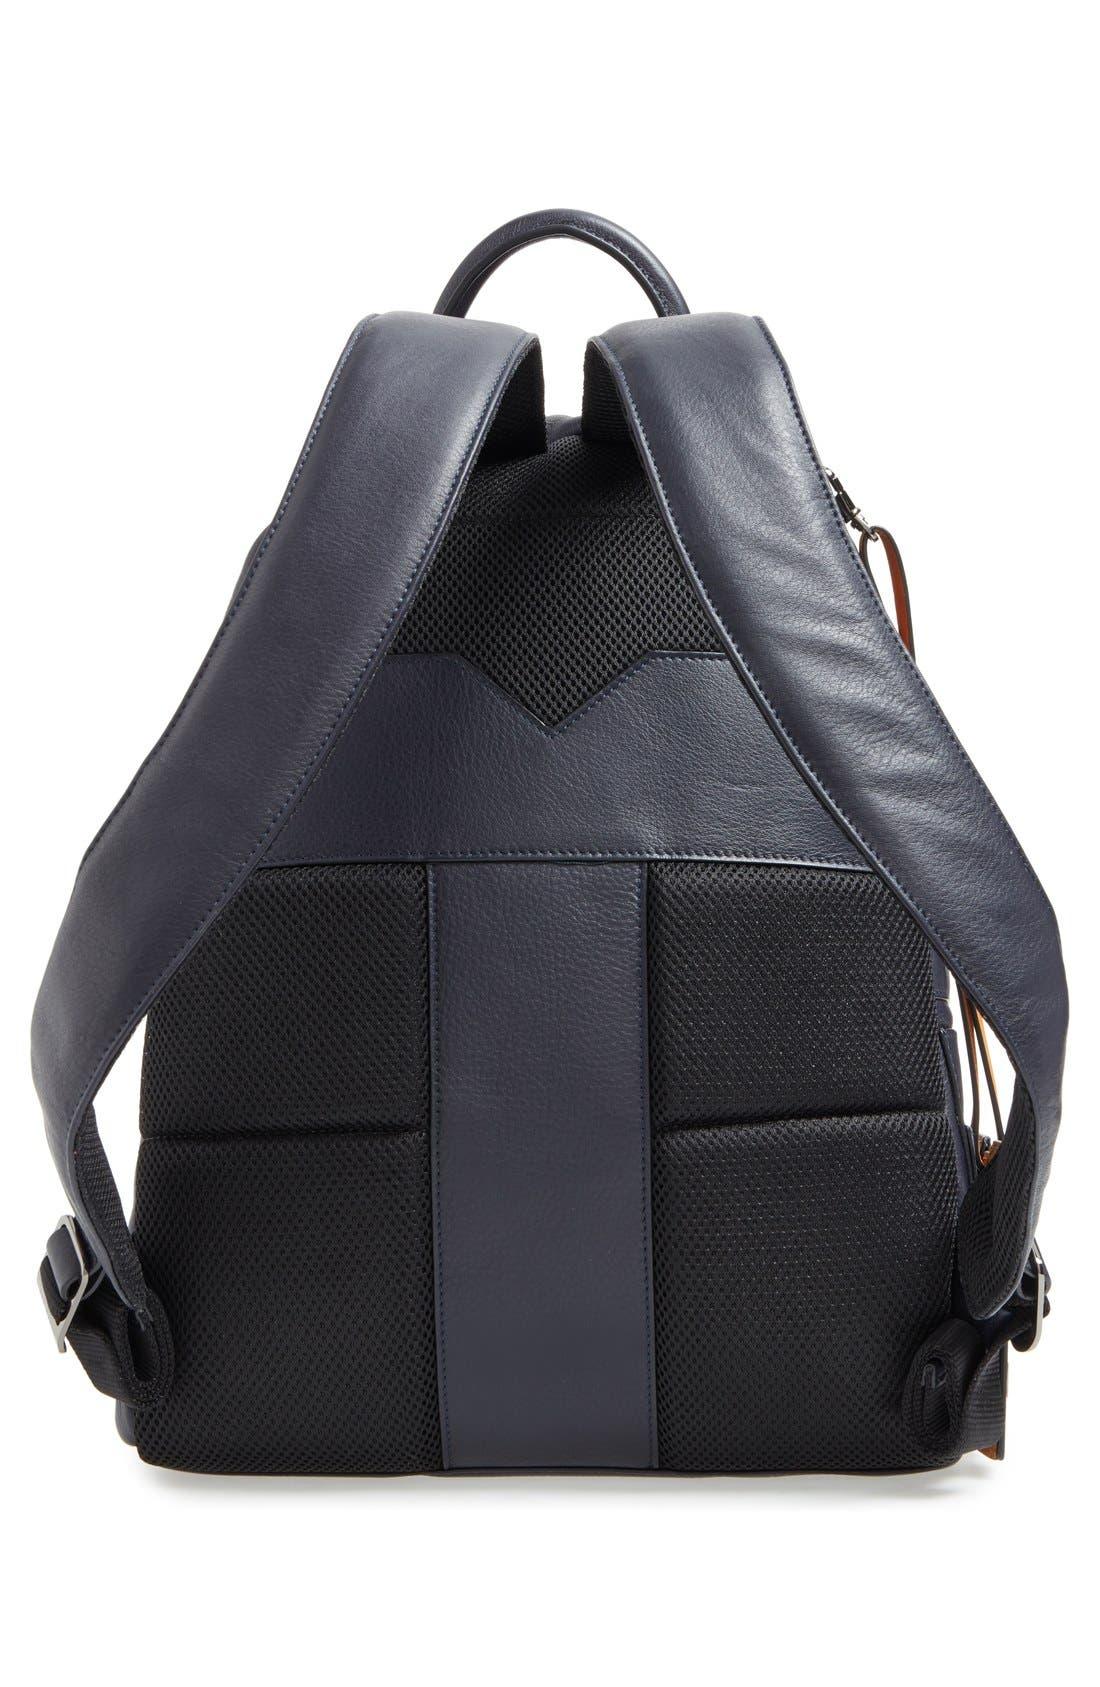 TED BAKER LONDON, 'Dollar' Leather Backpack, Alternate thumbnail 6, color, 410